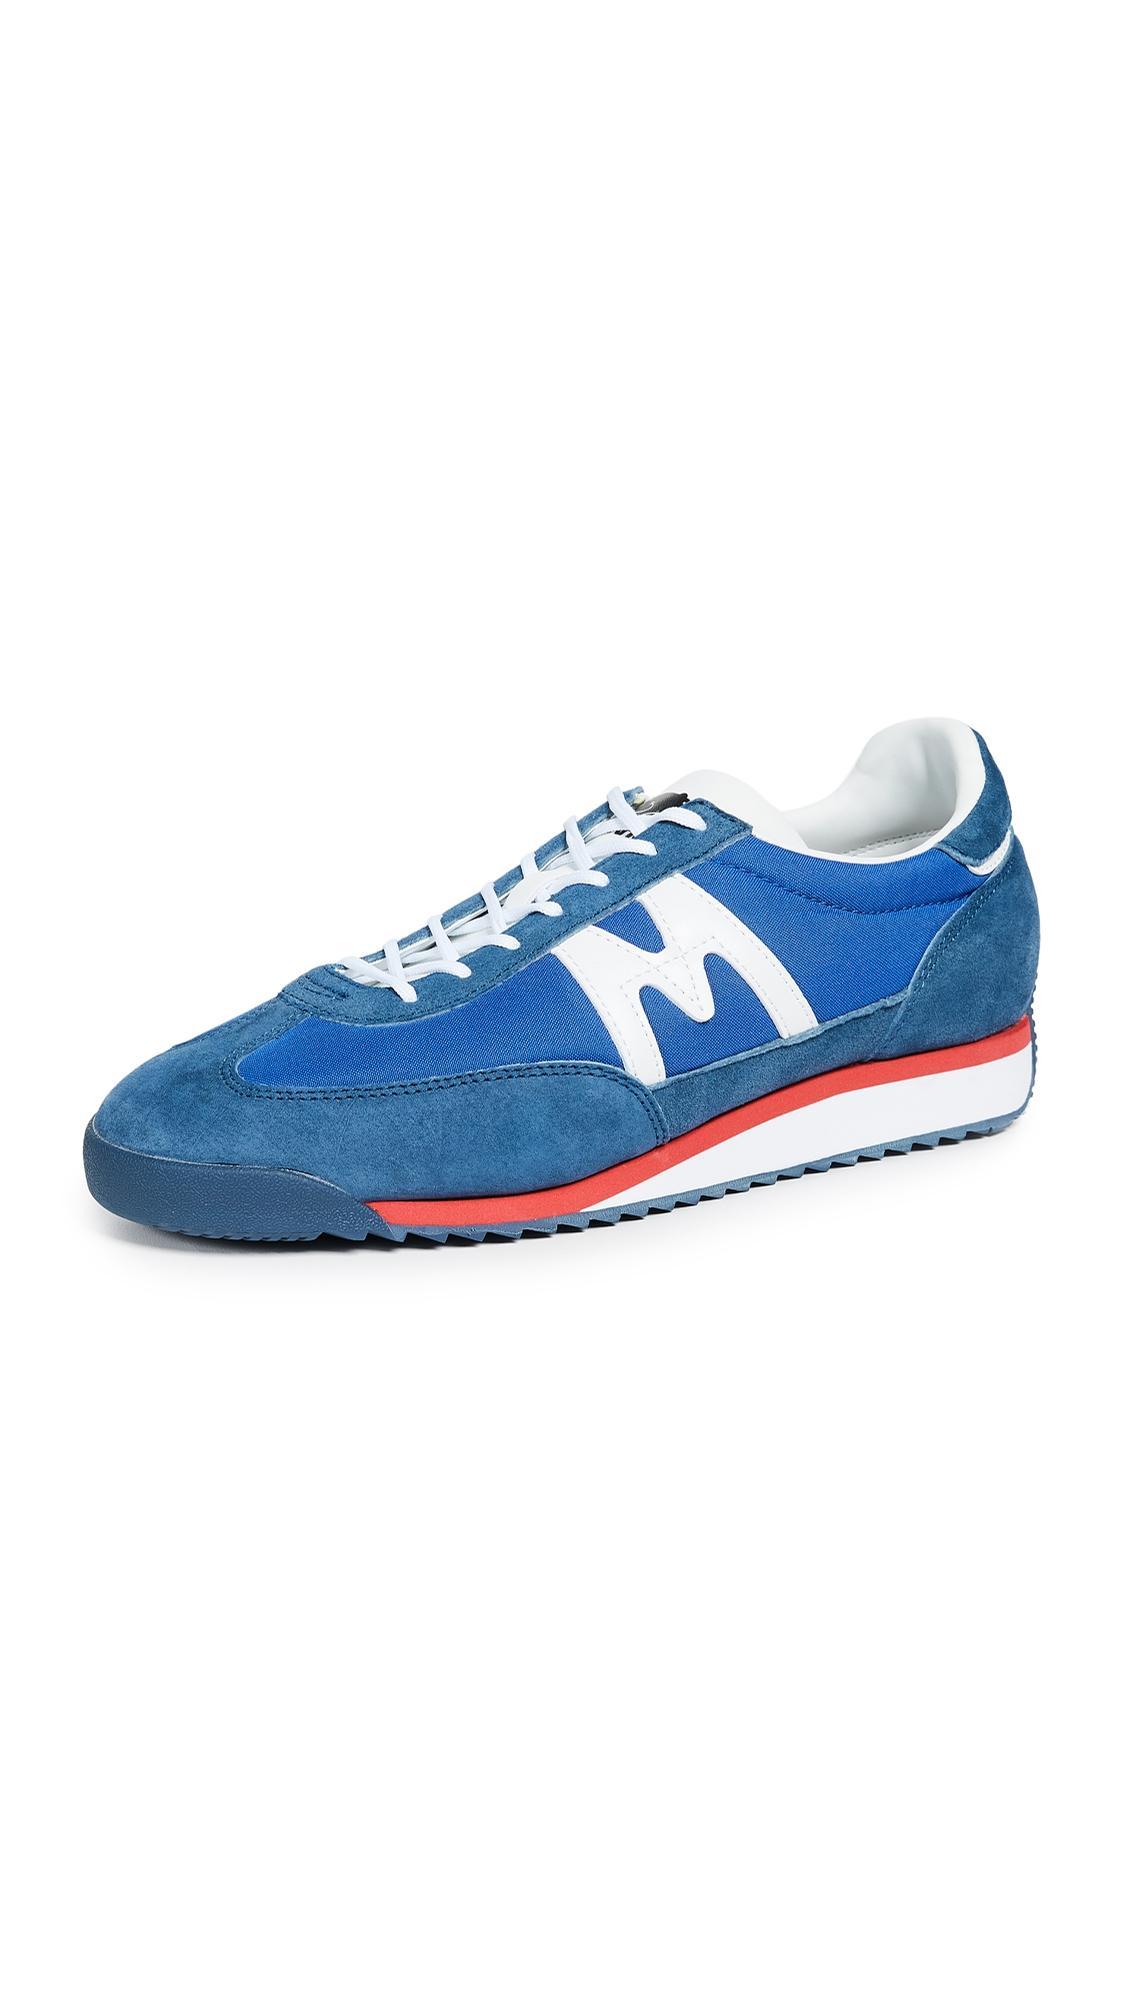 eba5a4281c9 Karhu Championair Sneakers In Classic Blue White